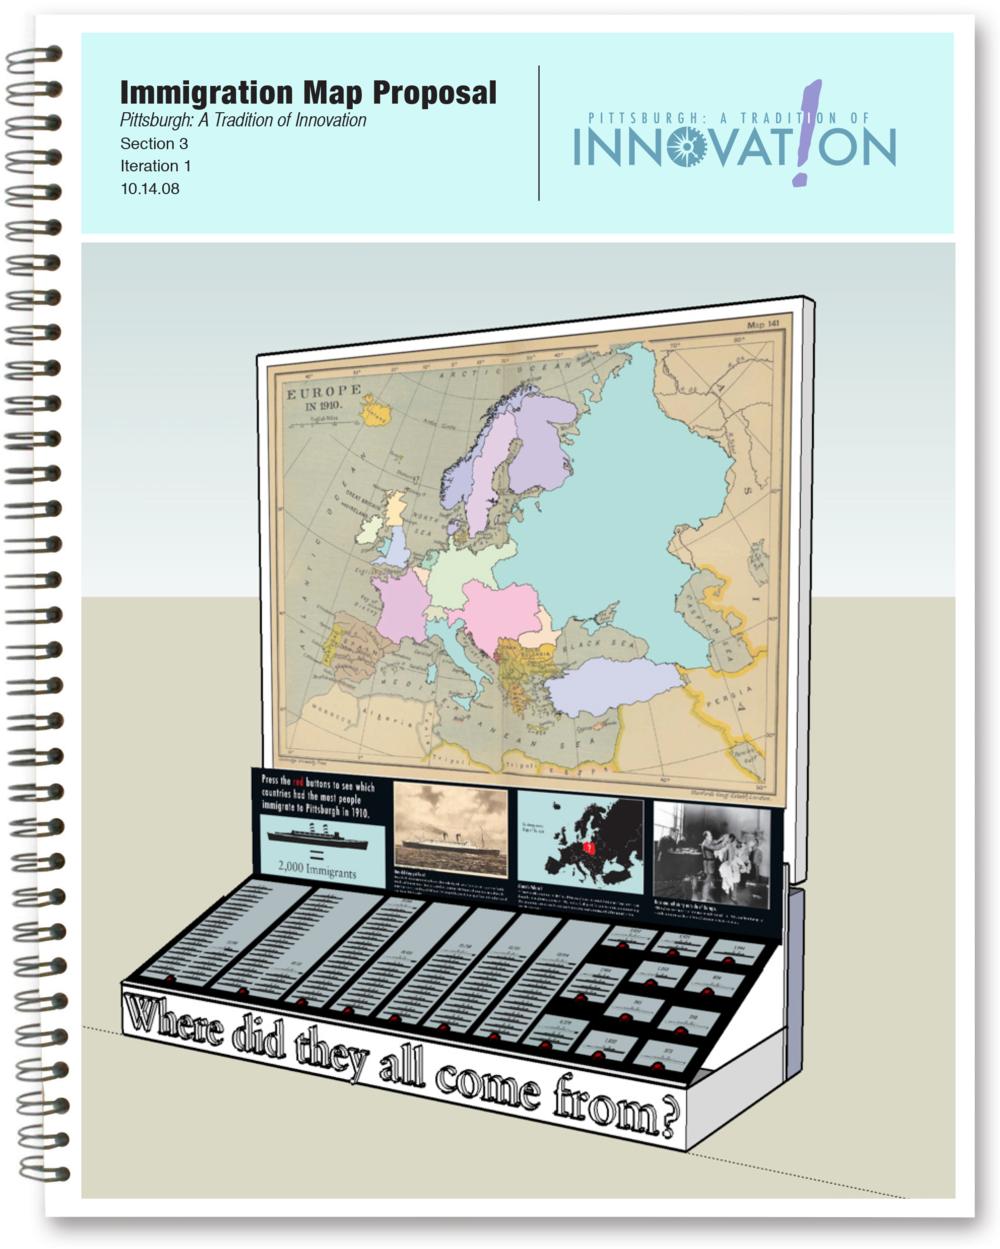 Immigration Exhibit Interactive